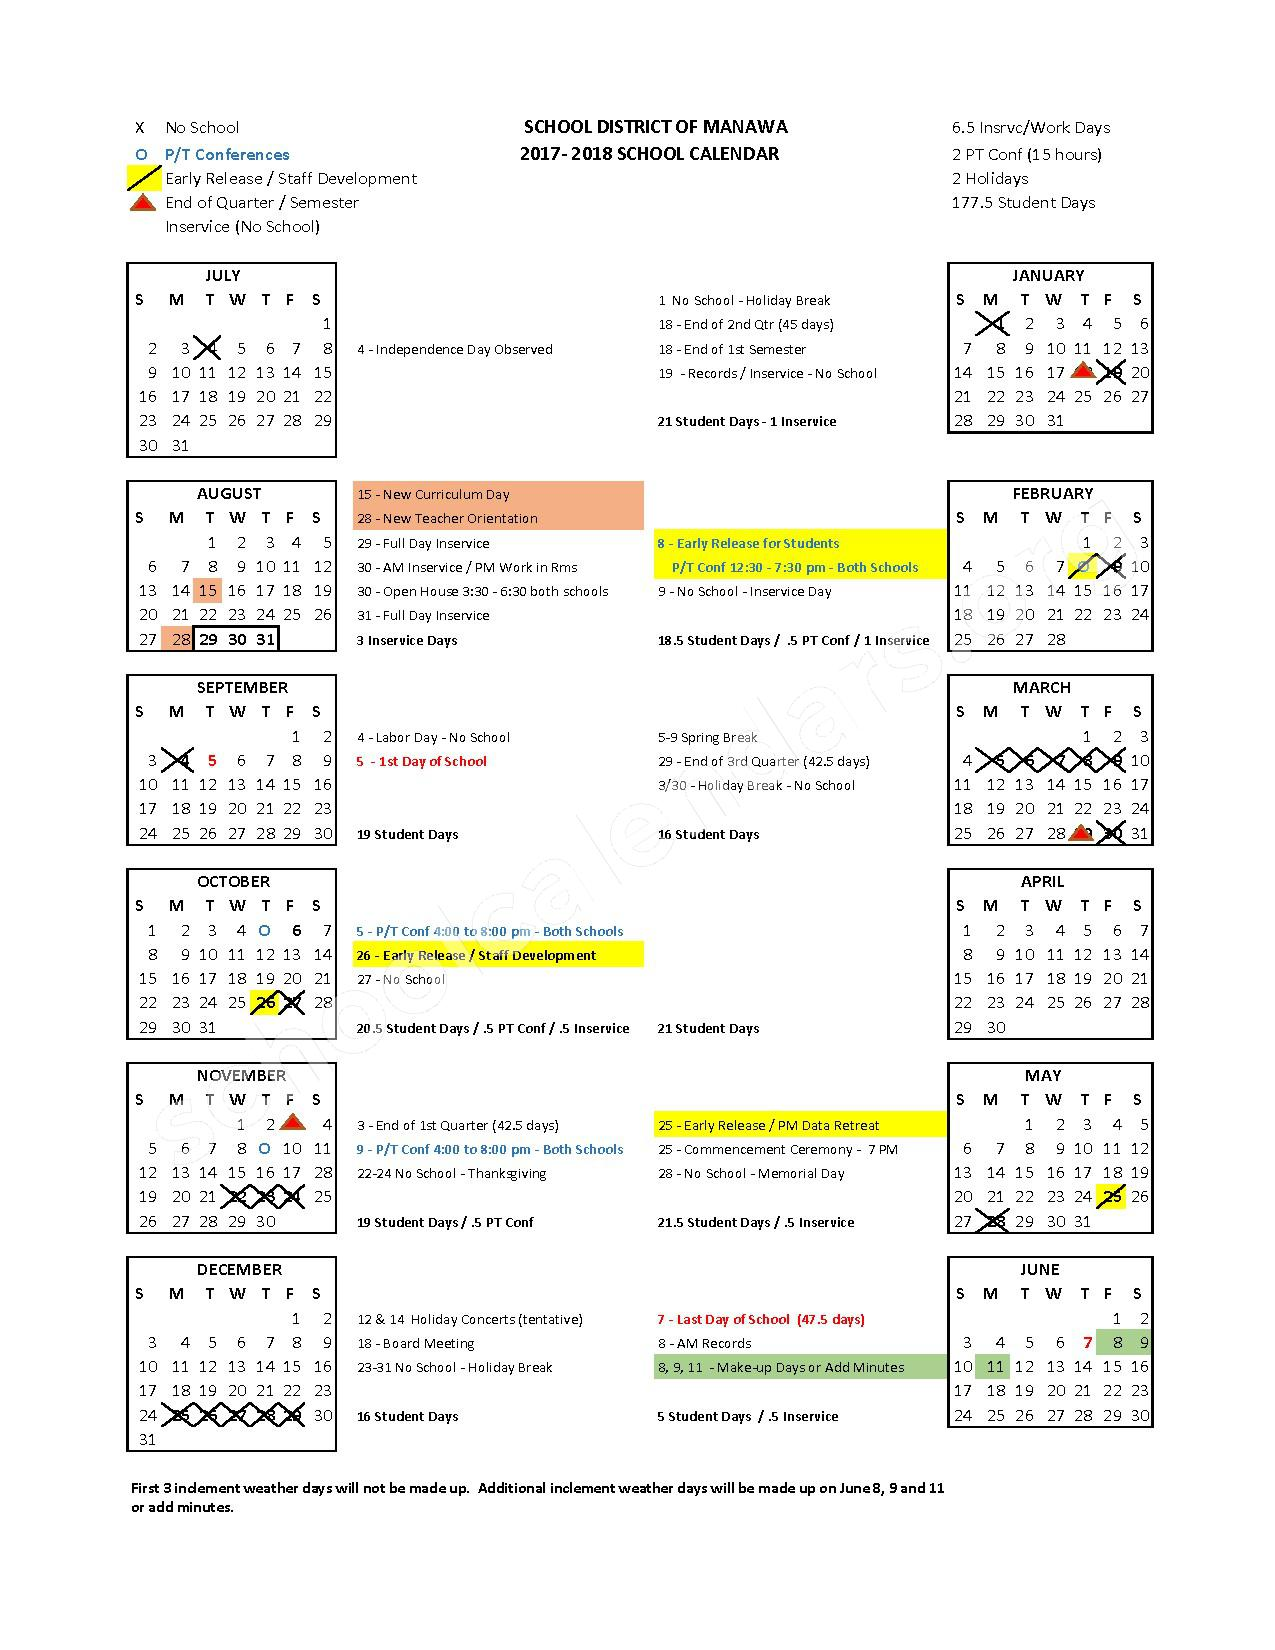 2017 - 2018 School Calendar – Manawa School District – page 1